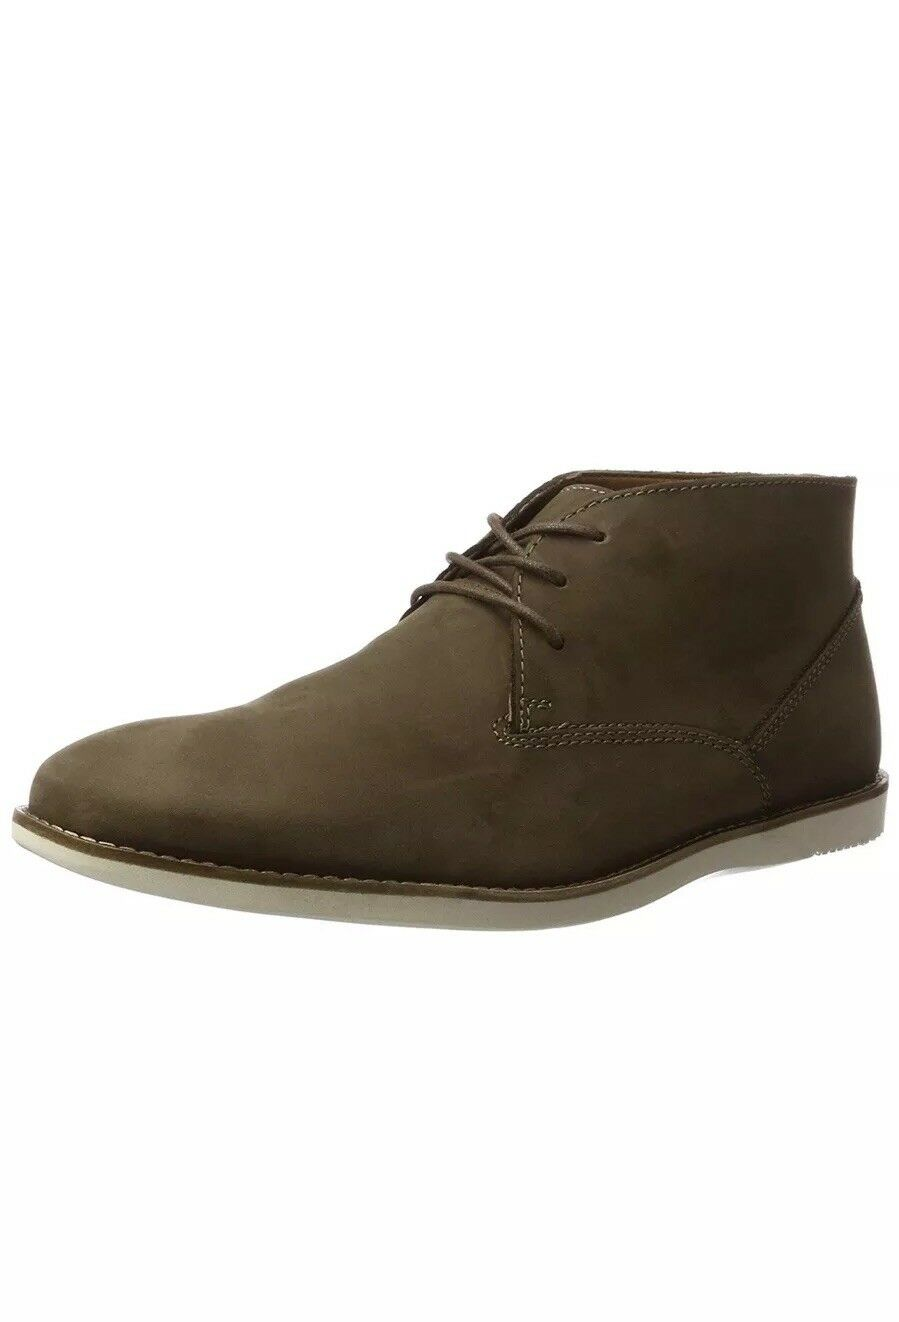 Clarks Men's Franson Top Chukka Boots [3007] UK 12 Brown